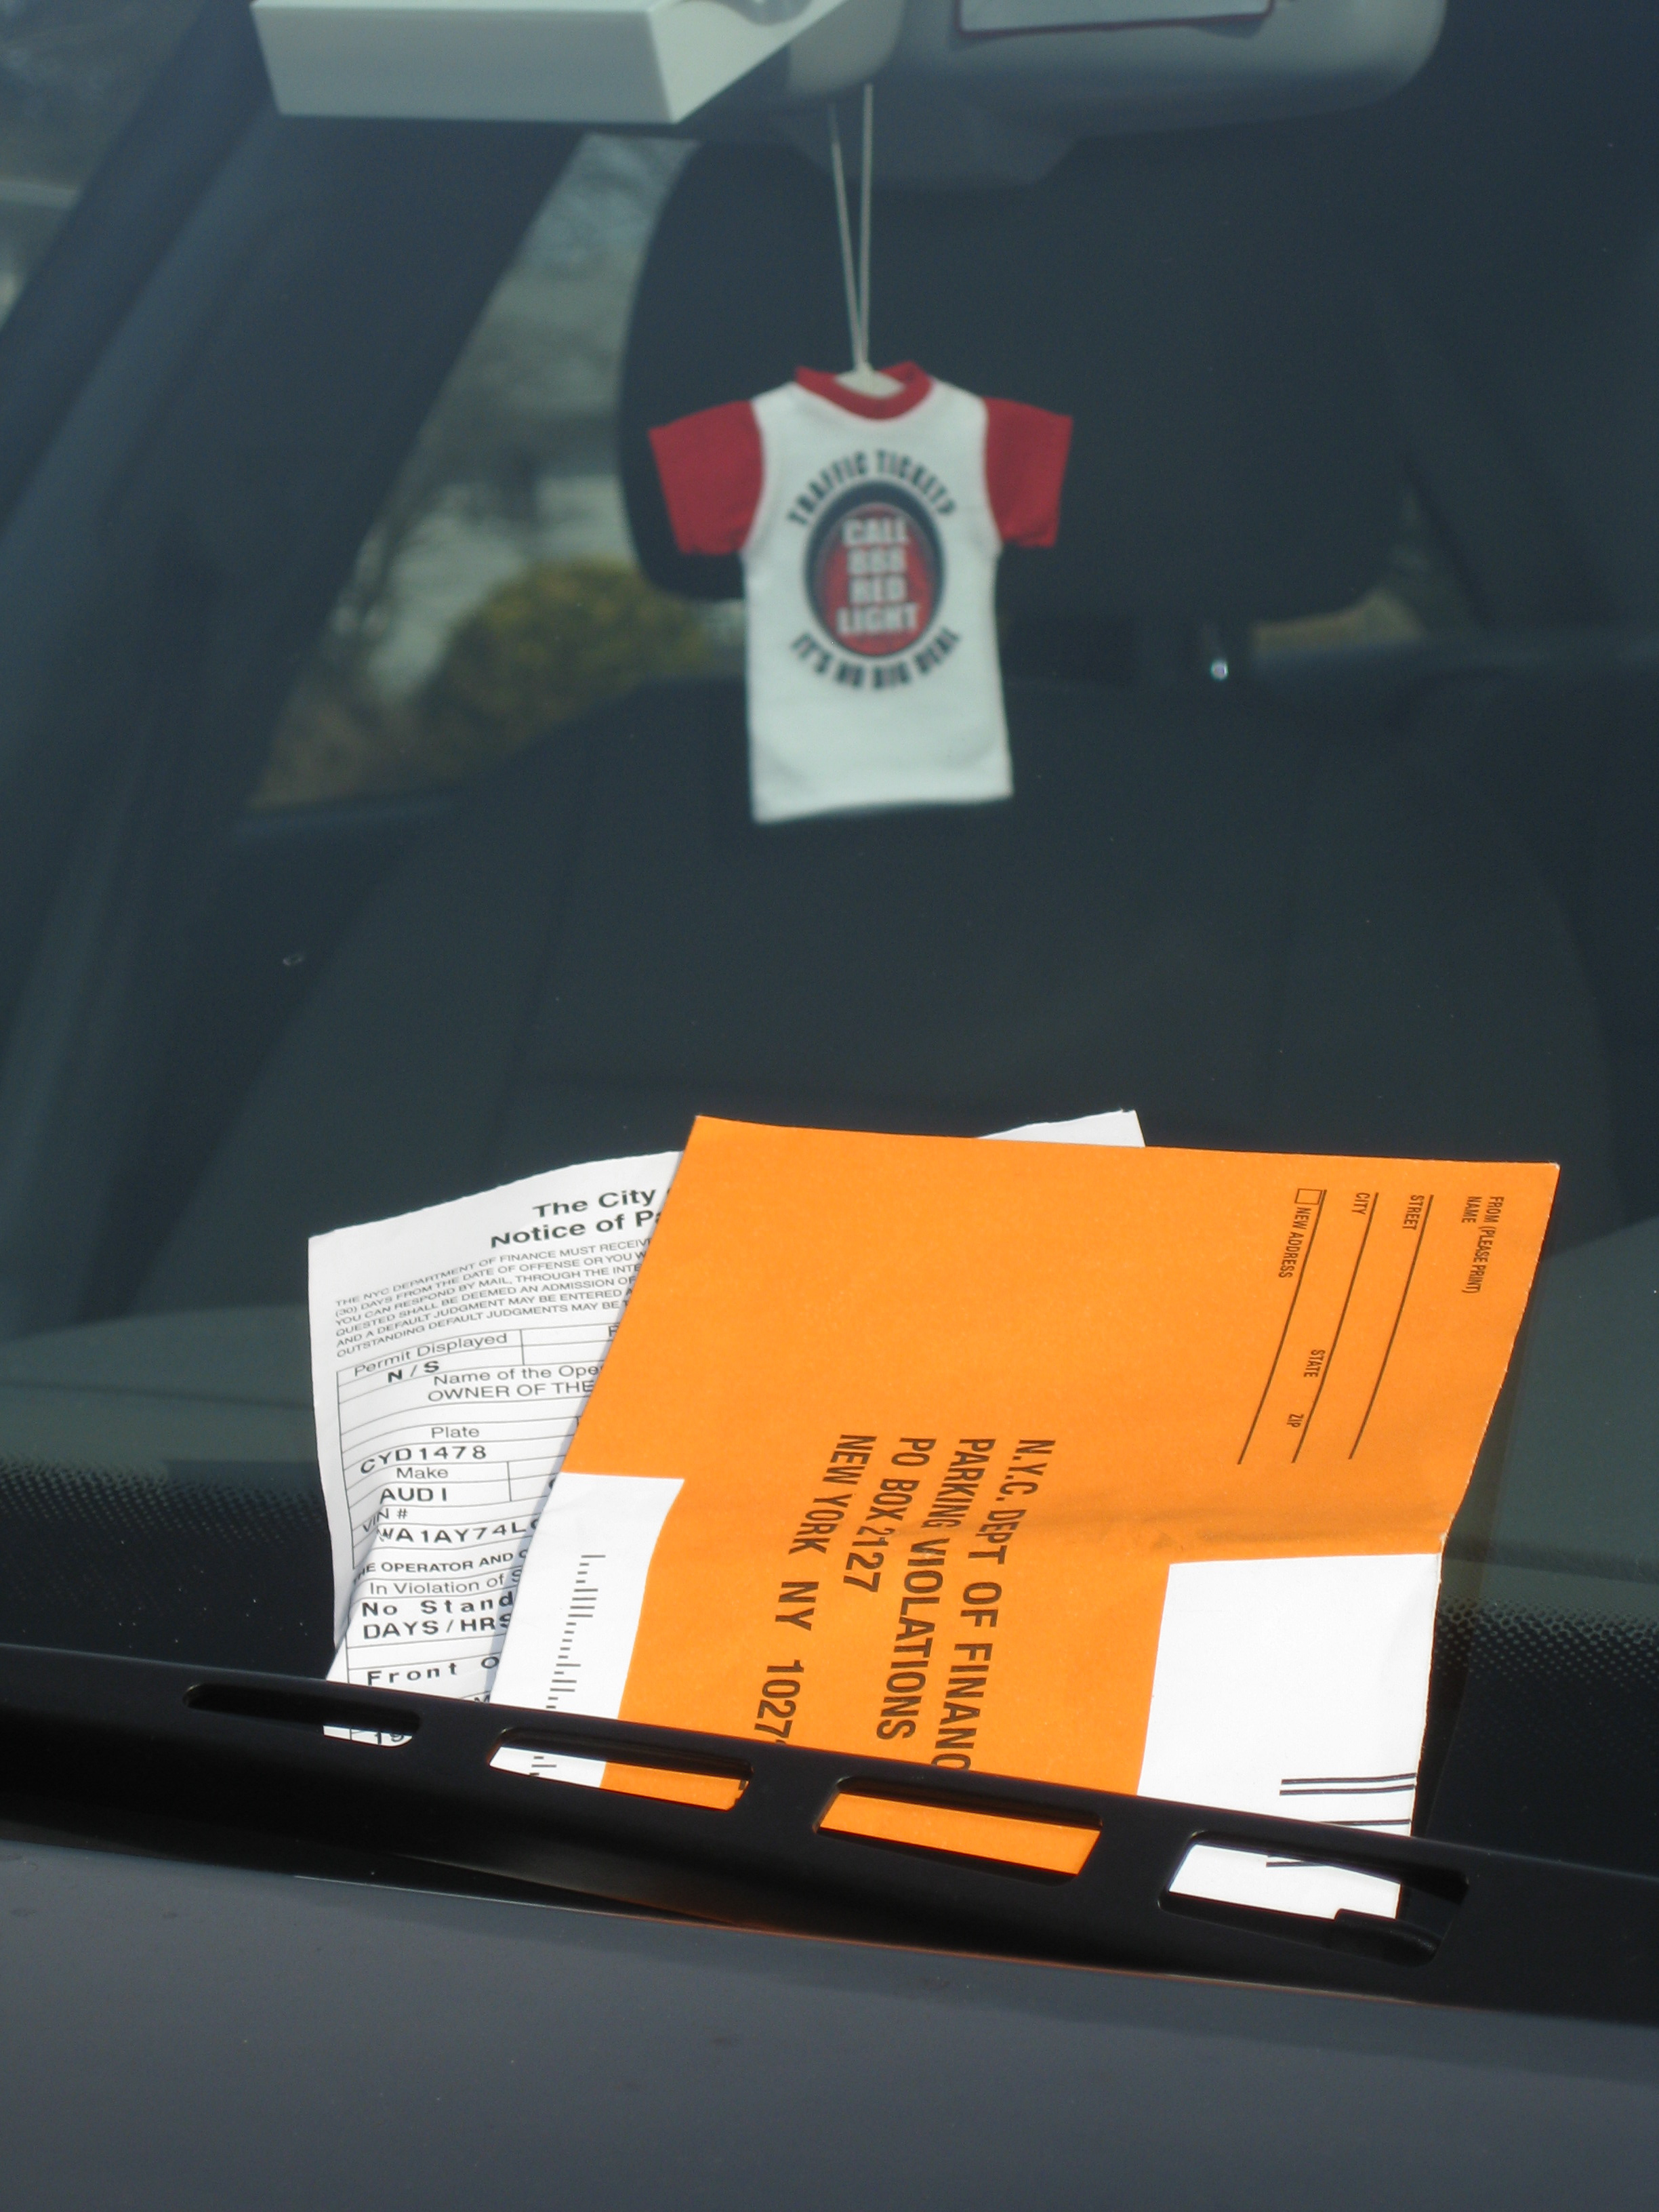 Fine Calgary photo radar ticket payment